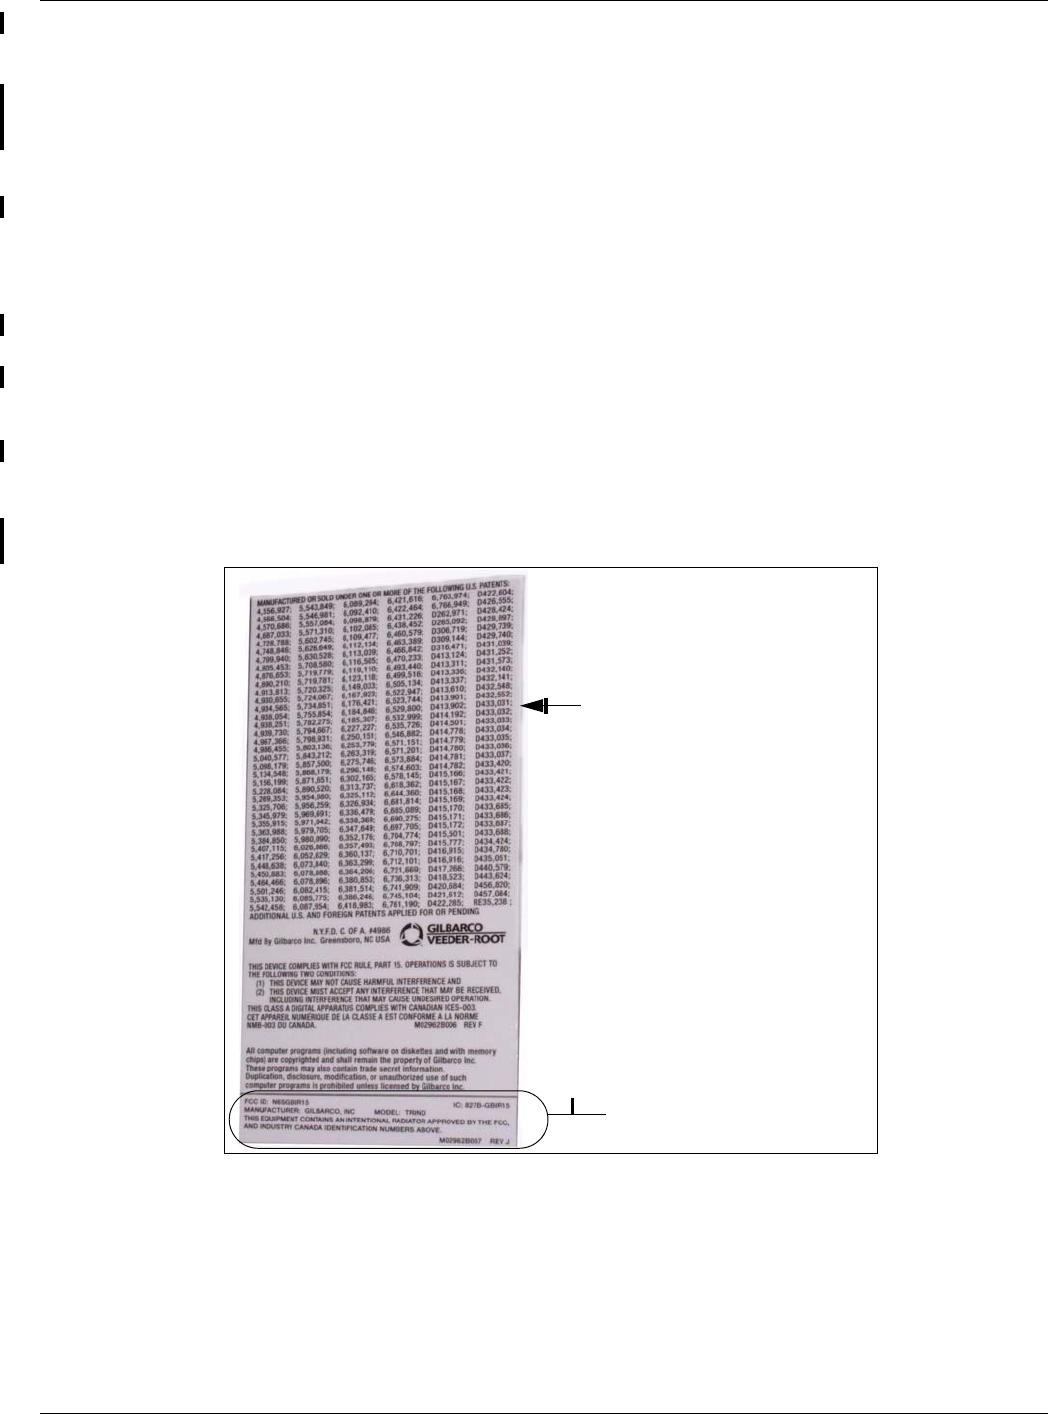 Gilbarco GBIR16 Card Reader Transmitter User Manual MDE 4635